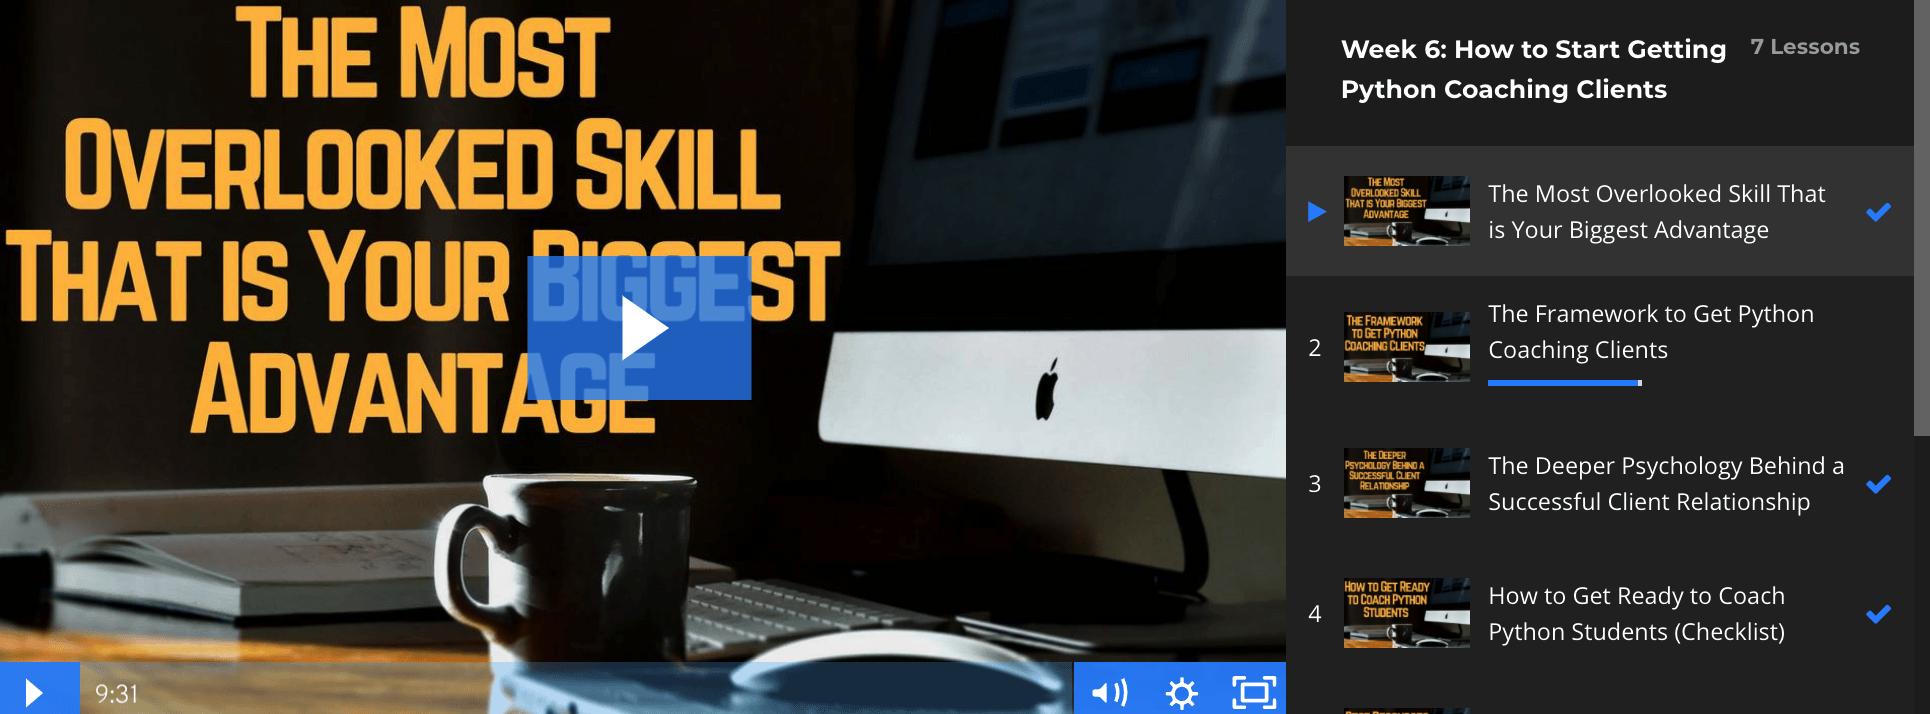 Rafeh Qazi - The Profitable Programmer Course 2.0 22